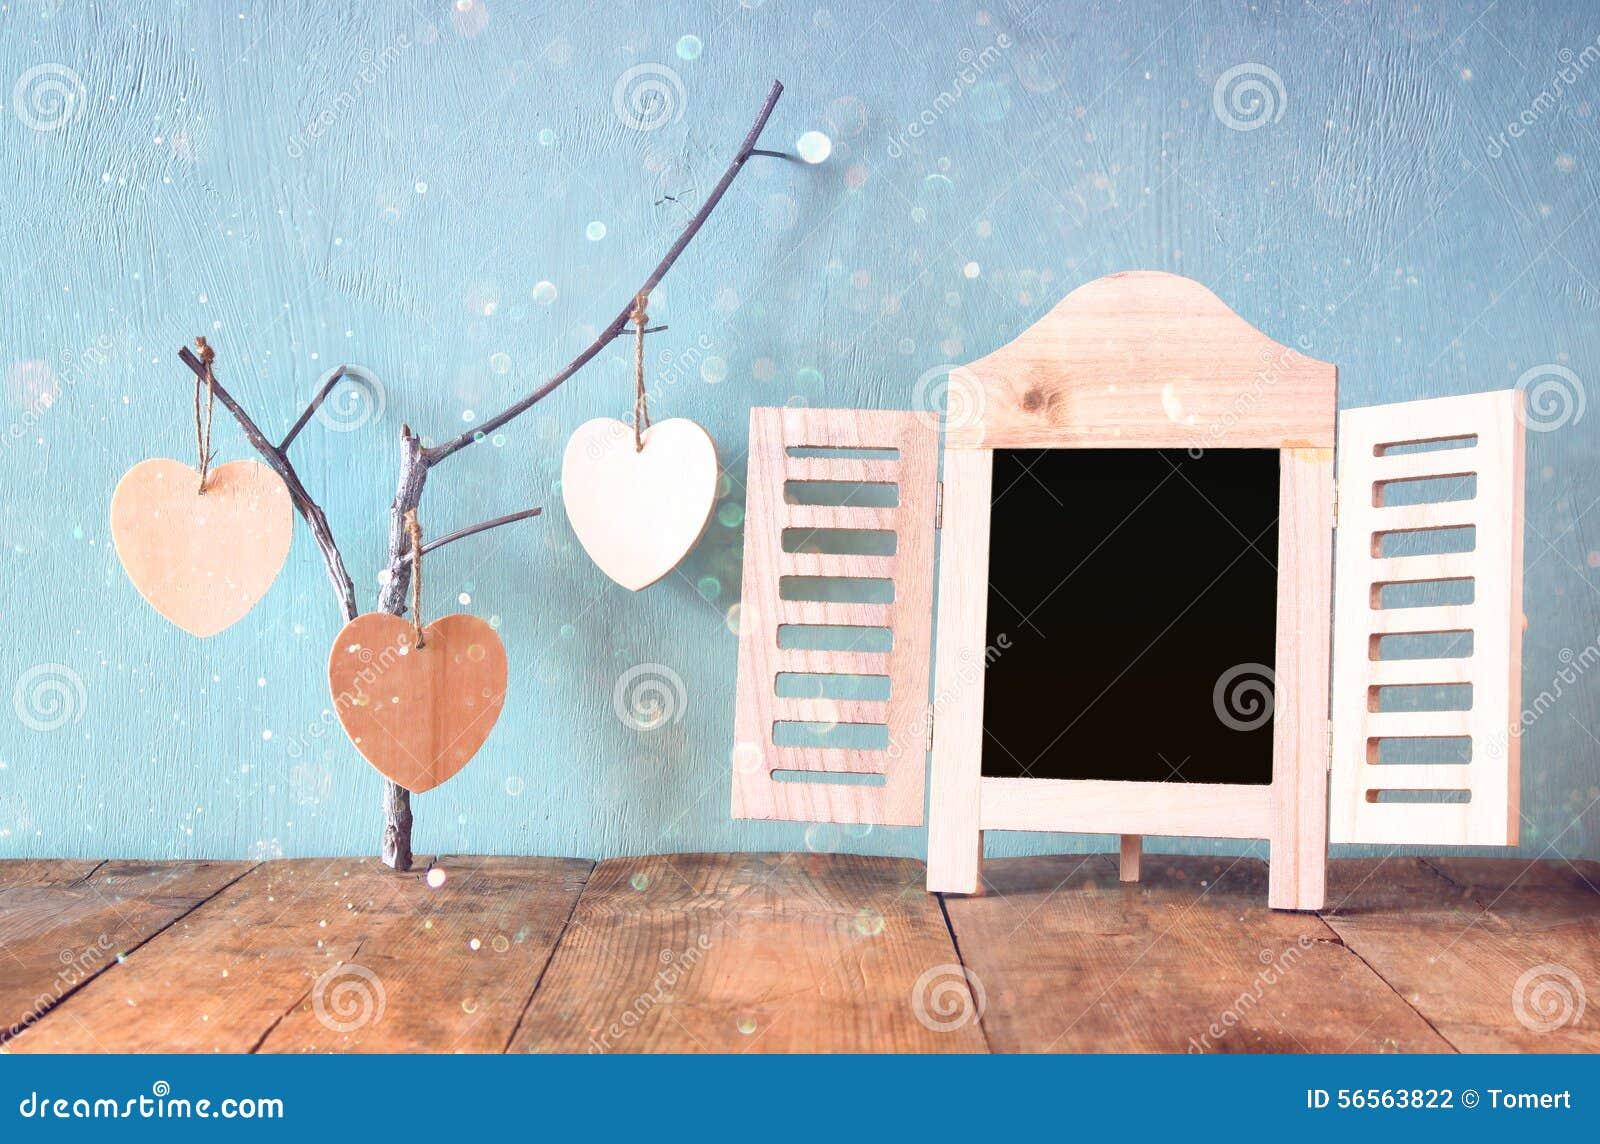 Download Διακοσμητικό πλαίσιο πινάκων κιμωλίας και ξύλινες κρεμώντας καρδιές πέρα από τον ξύλινο πίνακα έτοιμος για το κείμενο ή το πρότυπ Στοκ Εικόνες - εικόνα από ντεκόρ, μαύρα: 56563822